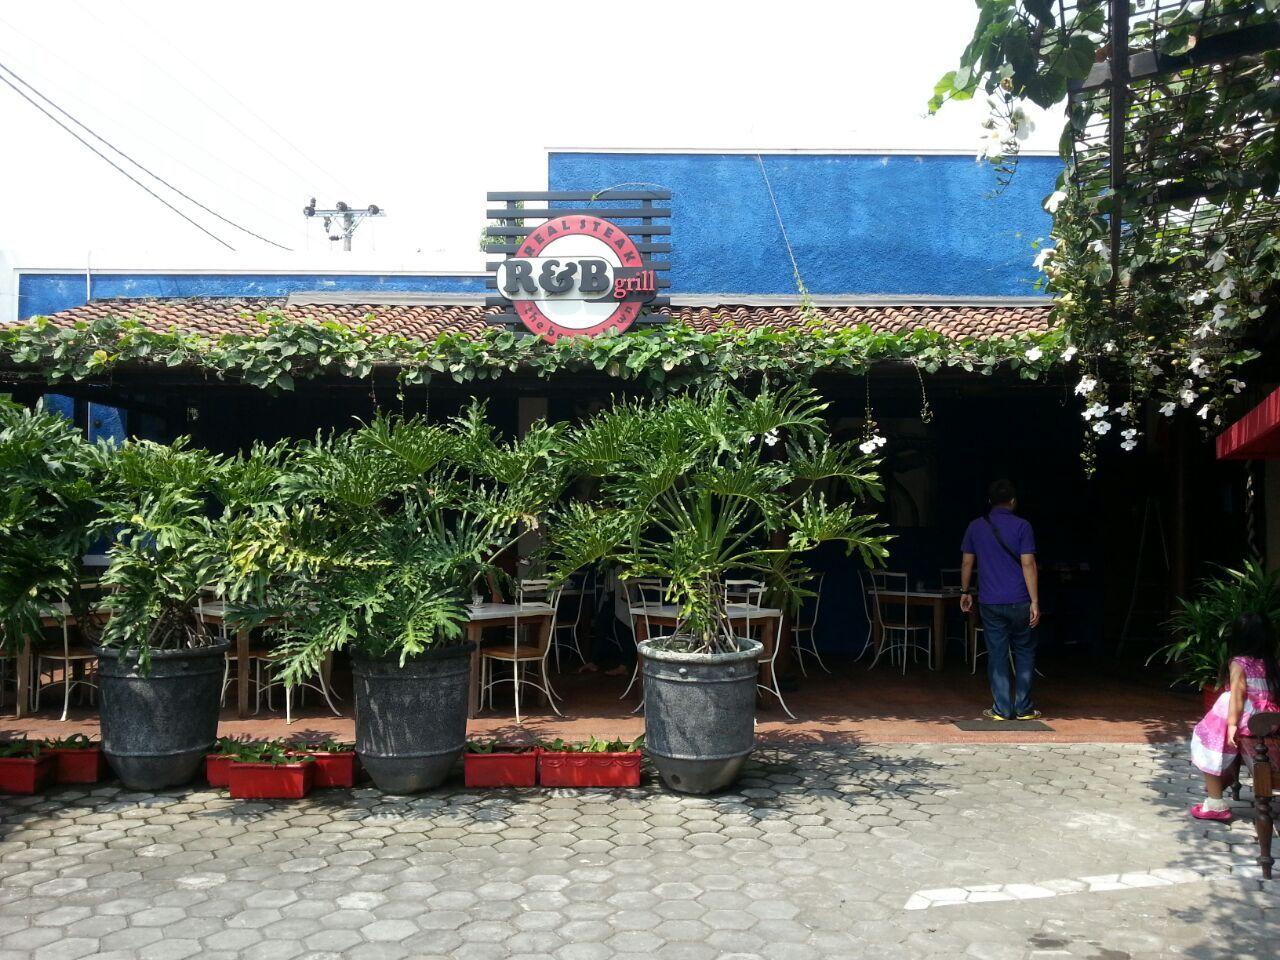 R & B Grill Yogyakarta Daftar Menu Yogyakarta, Tips